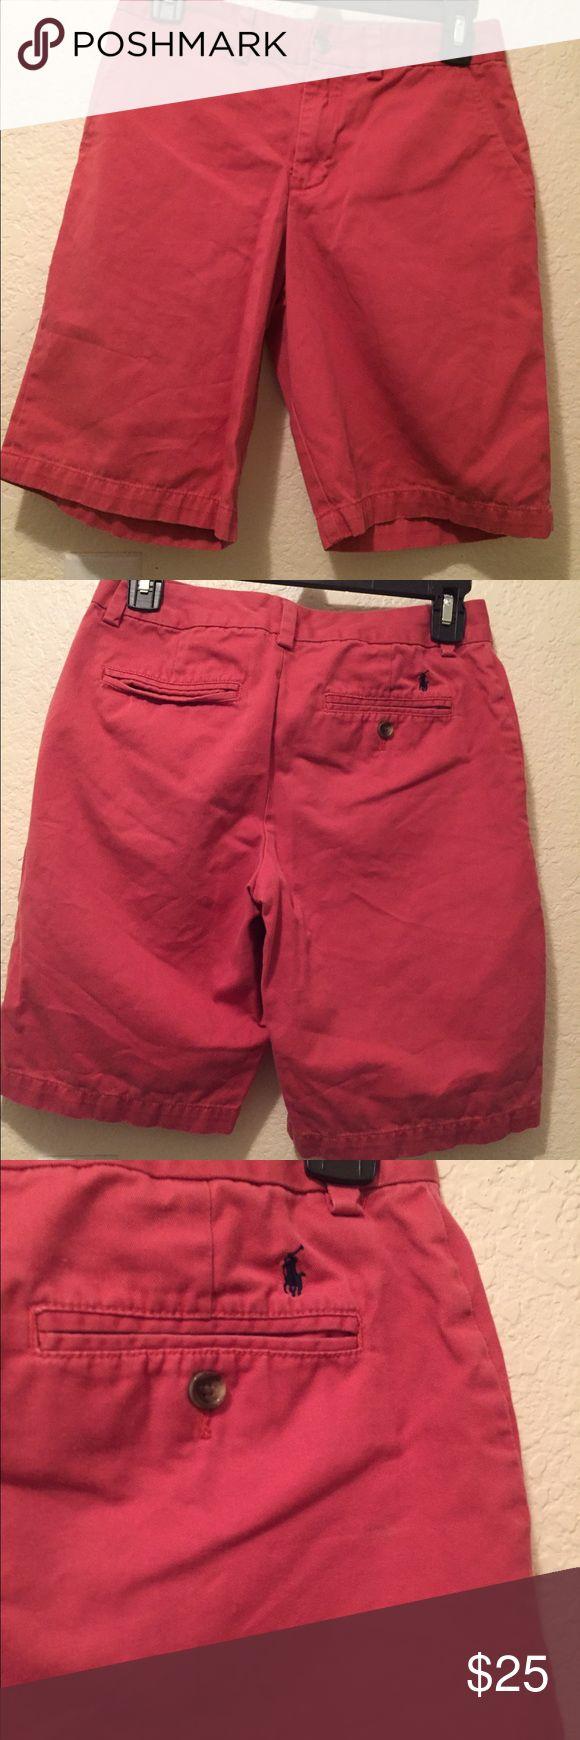 Boy's Polo Ralph Lauren Shorts Size 16 Boy's Polo Ralph Lauren Shorts Size 16 Polo by Ralph Lauren Bottoms Shorts